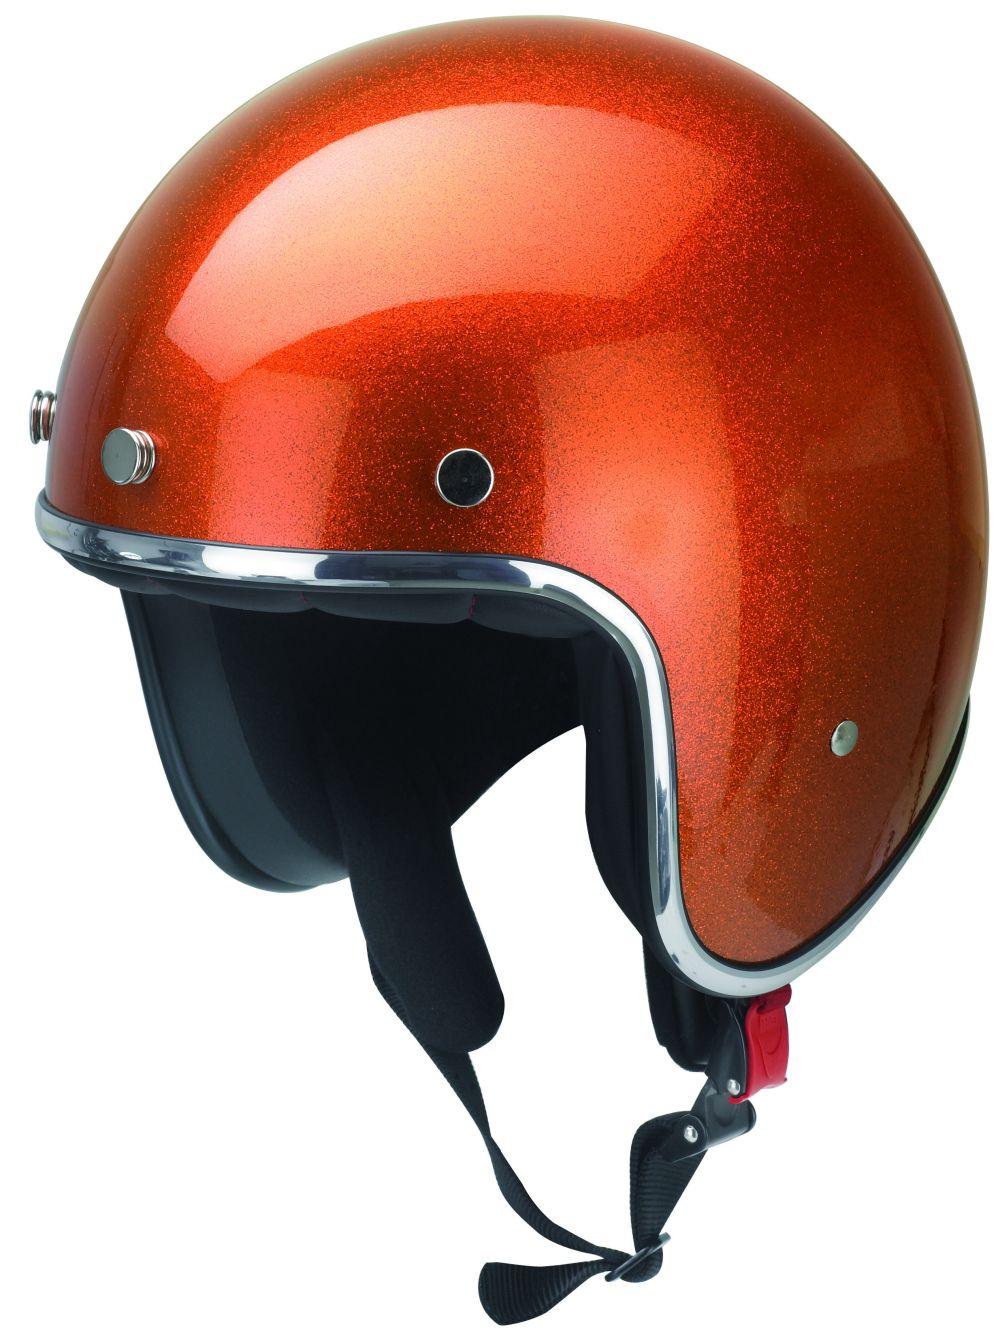 Motorrad Helm Motorradhelm Jethelm Kochmann Metallic Orange XS S M L XL XXL